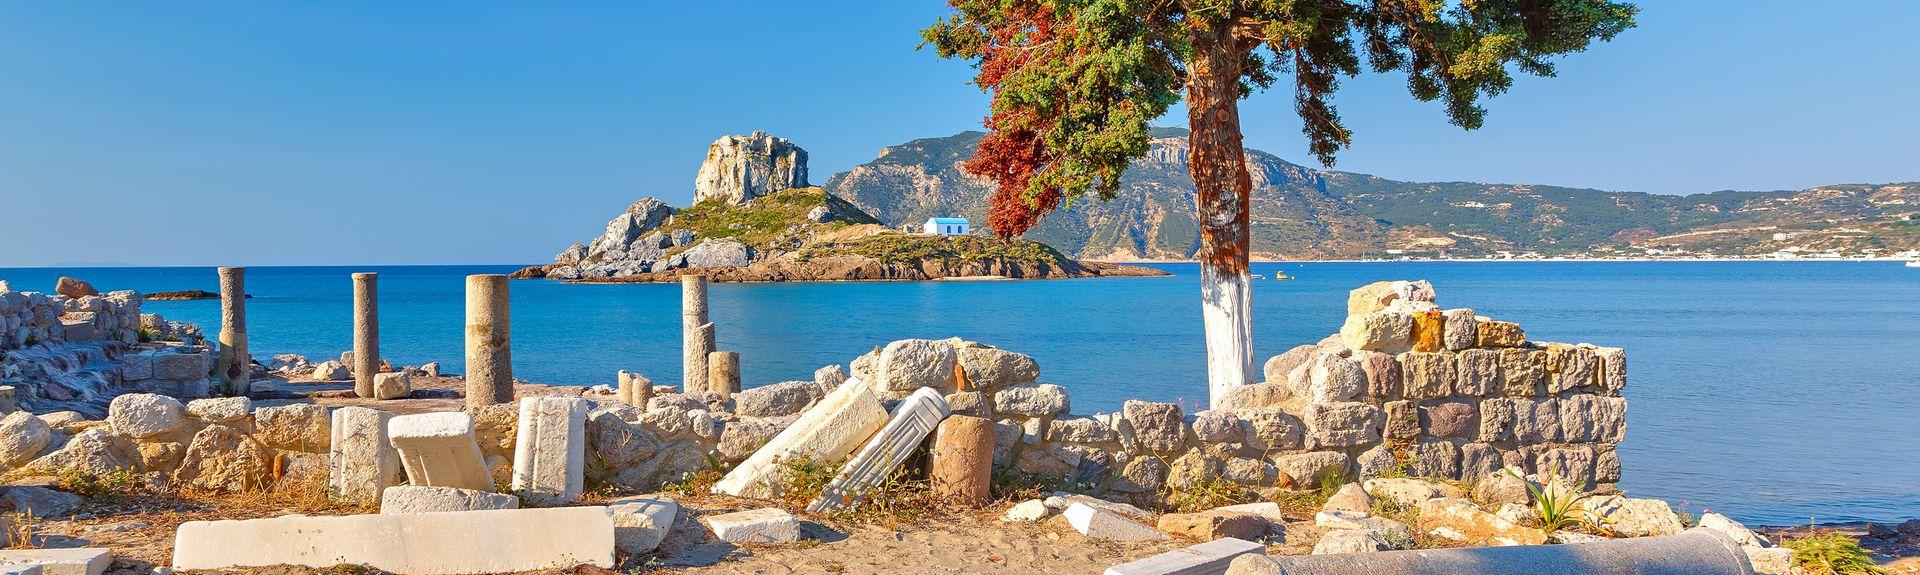 Kos, Iraklides, Egeanmeren saaret, Kreikka